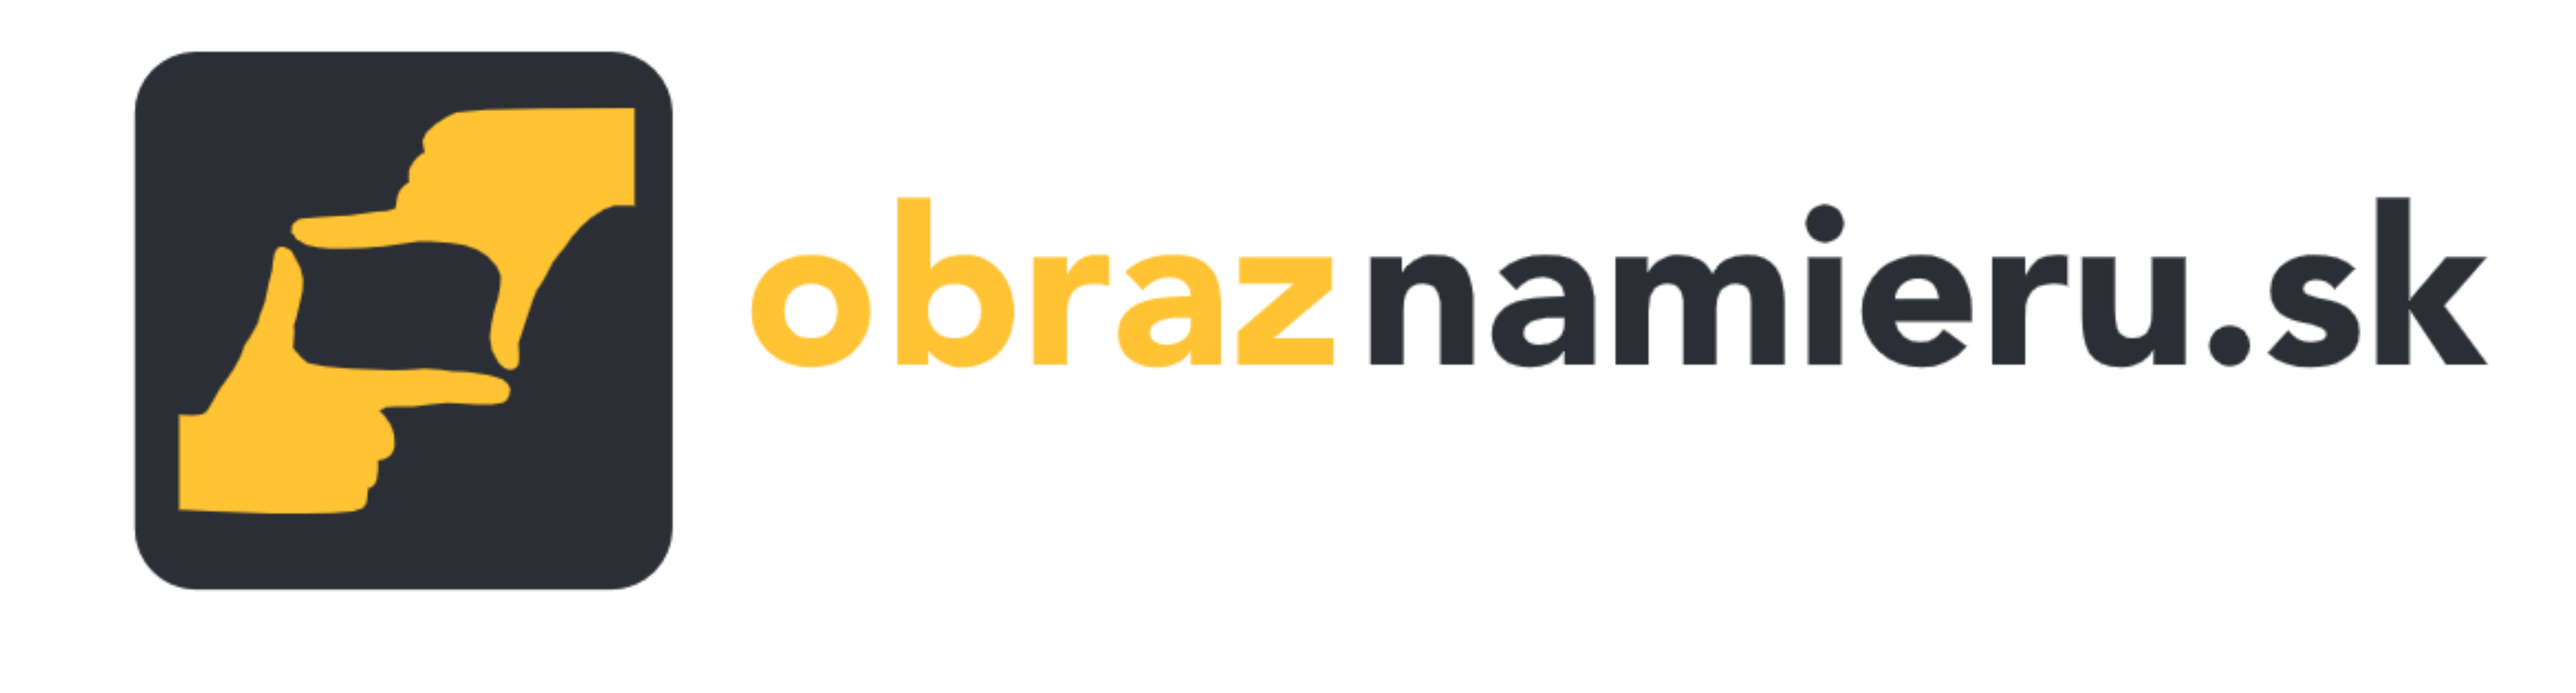 logoobraznamieru